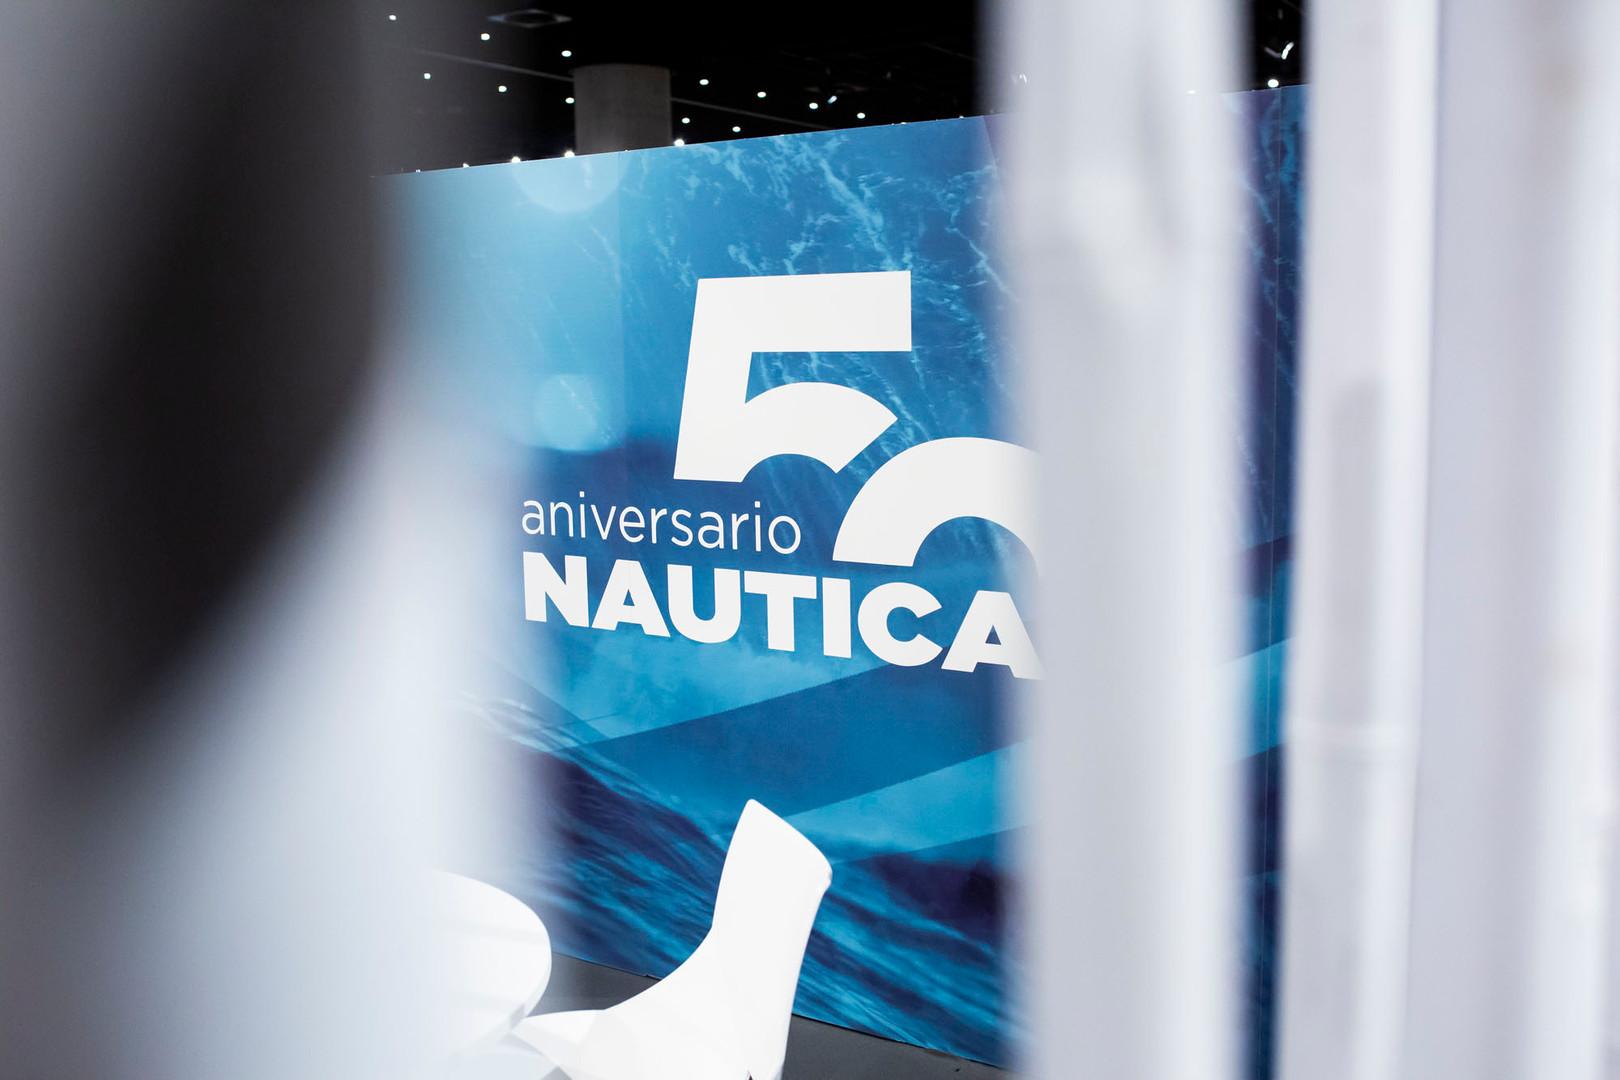 0001 nautical_sinaval.jpg